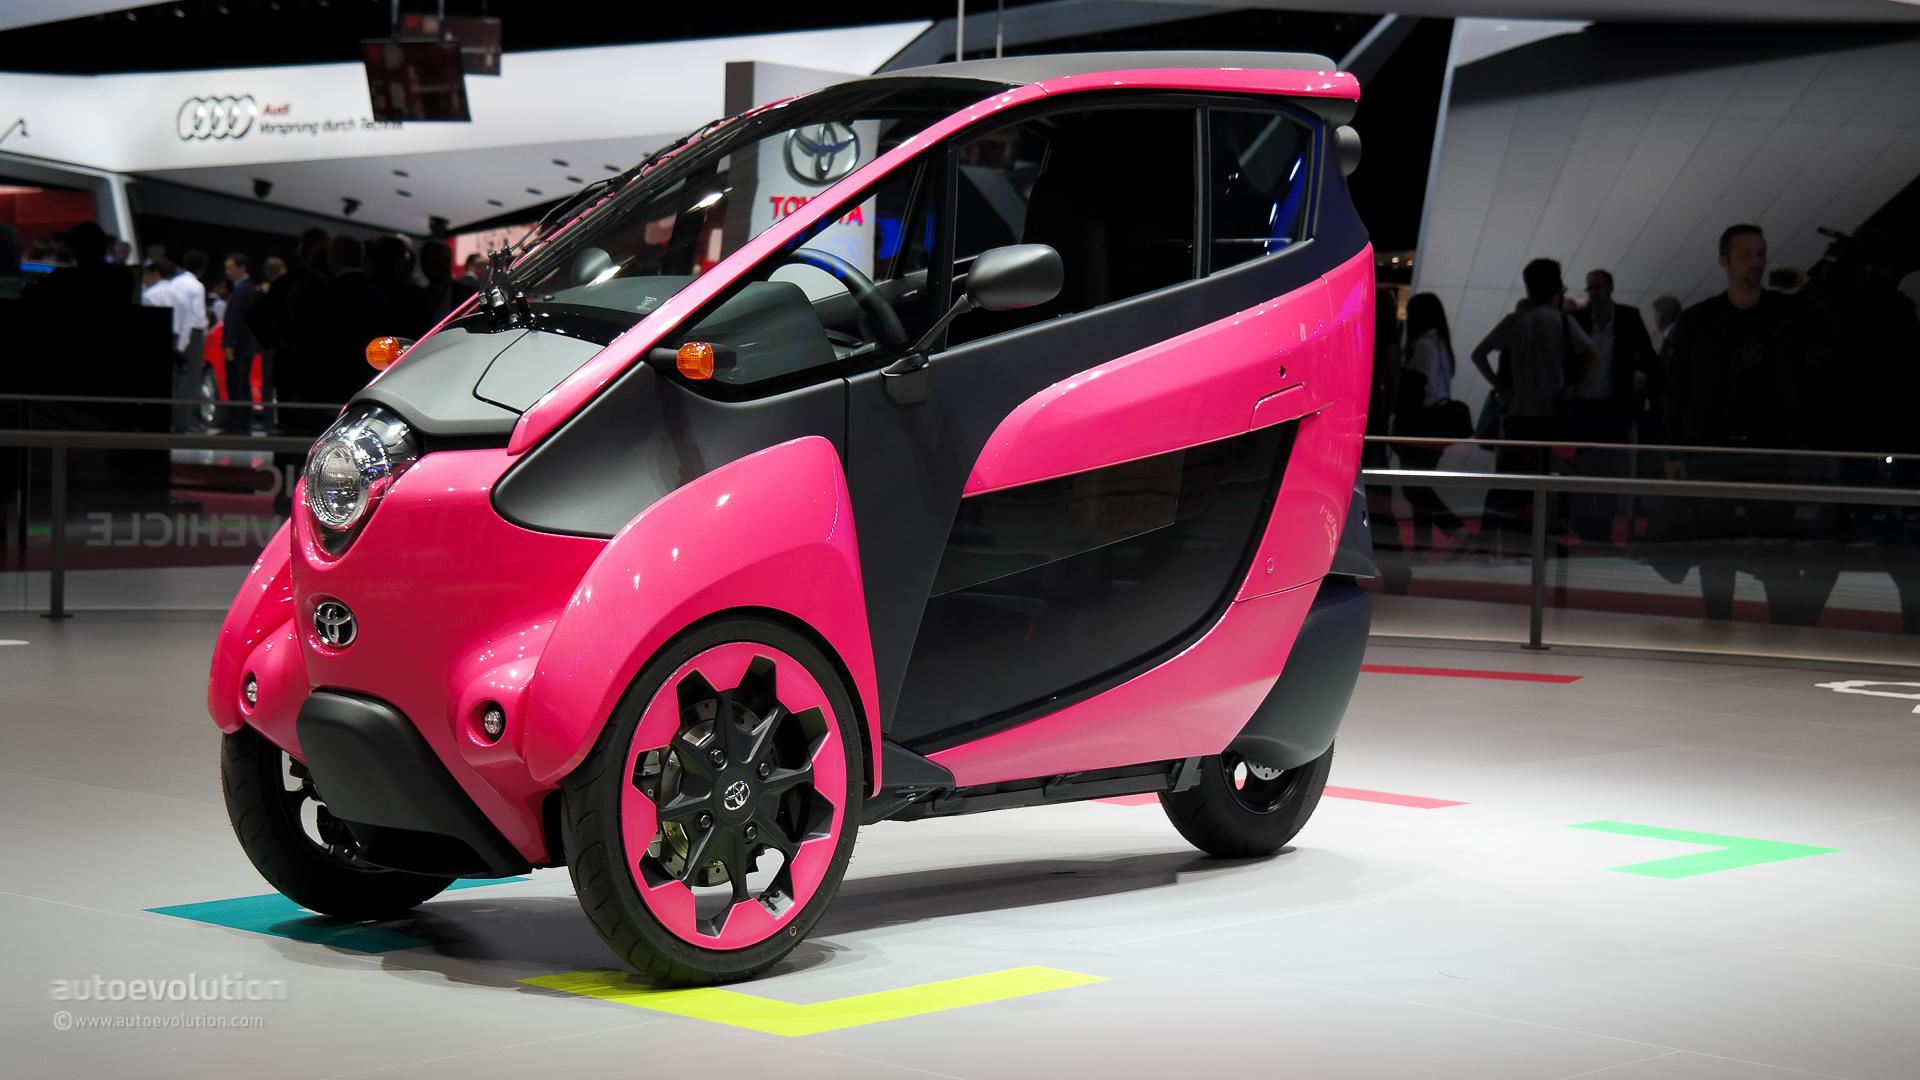 toyota i road wears pink at paris motor show 2014 live photos autoevolution. Black Bedroom Furniture Sets. Home Design Ideas